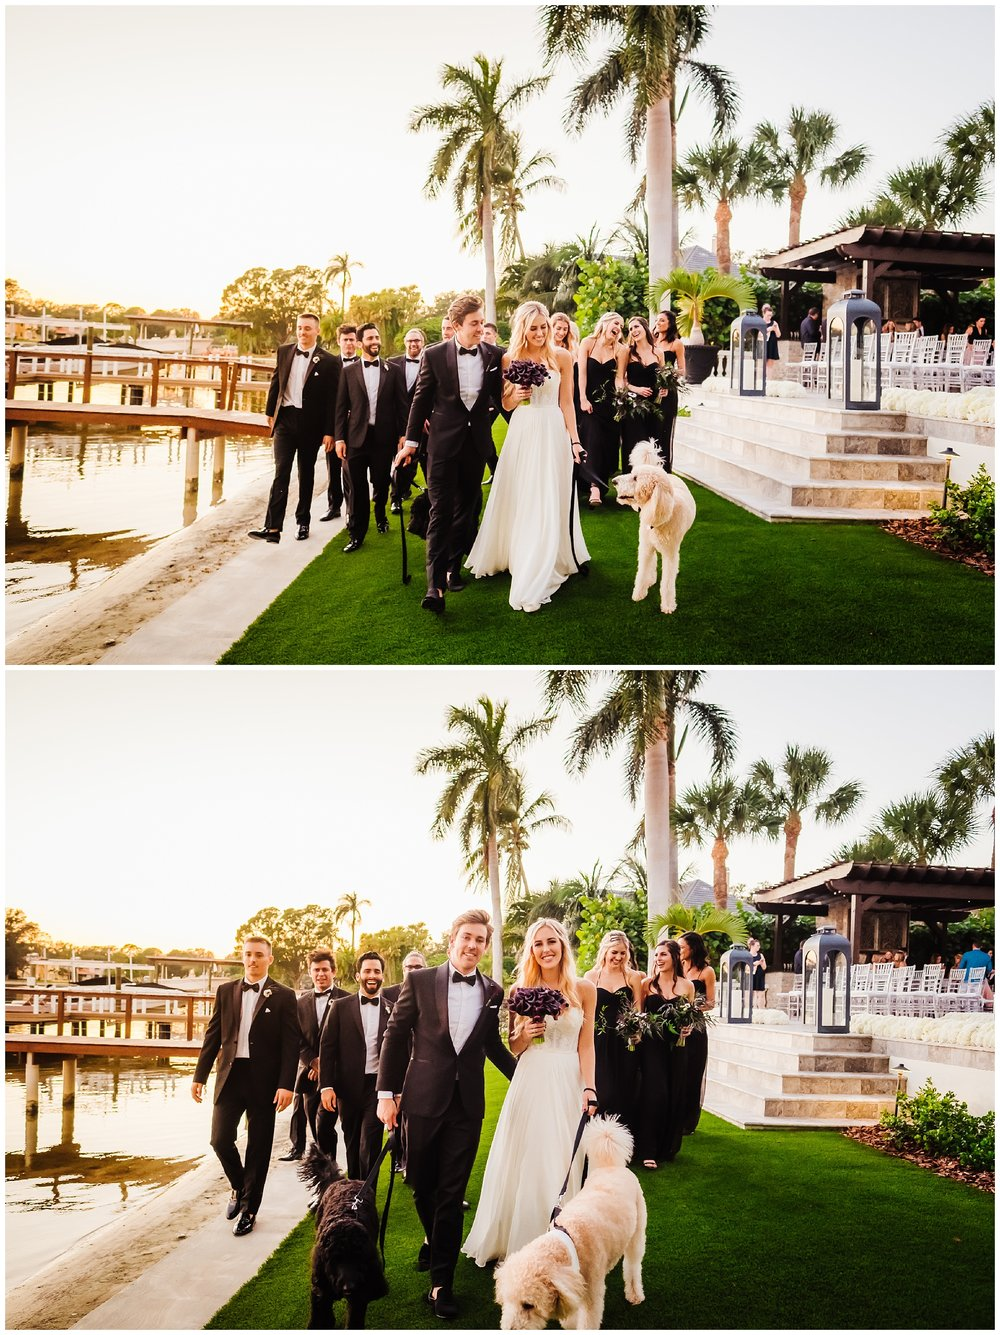 st-pete-wedding-photographer-backyard-luxury-snell-isle-vinoy_0050.jpg